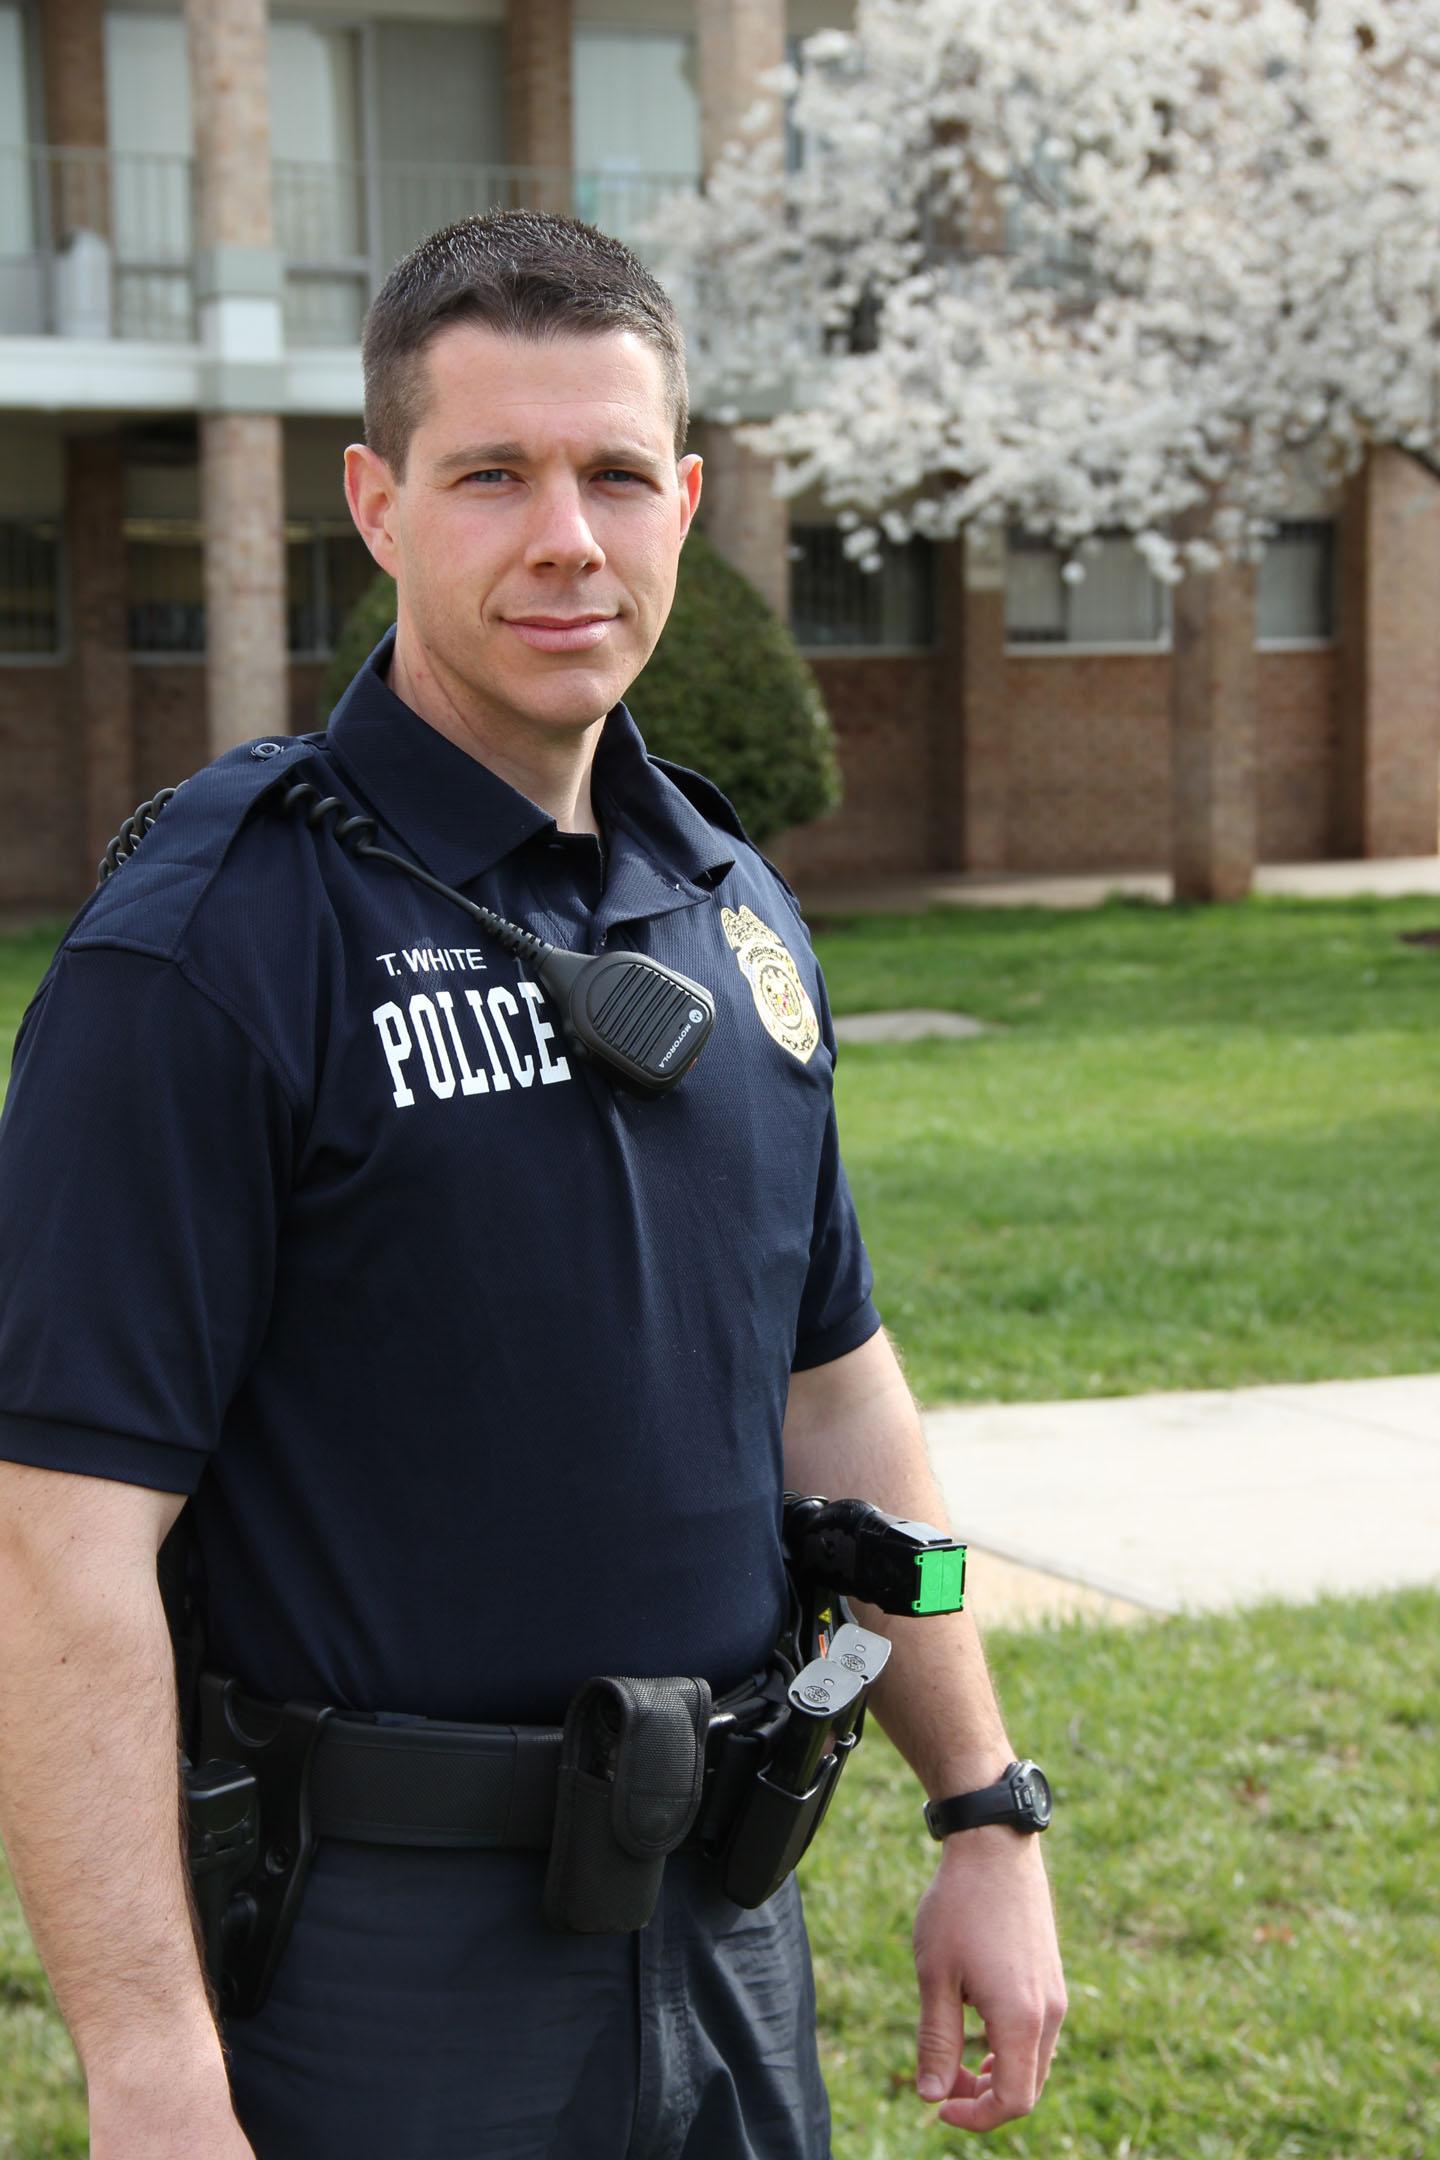 Greenbelt Maryland Police White Greenbelt Police